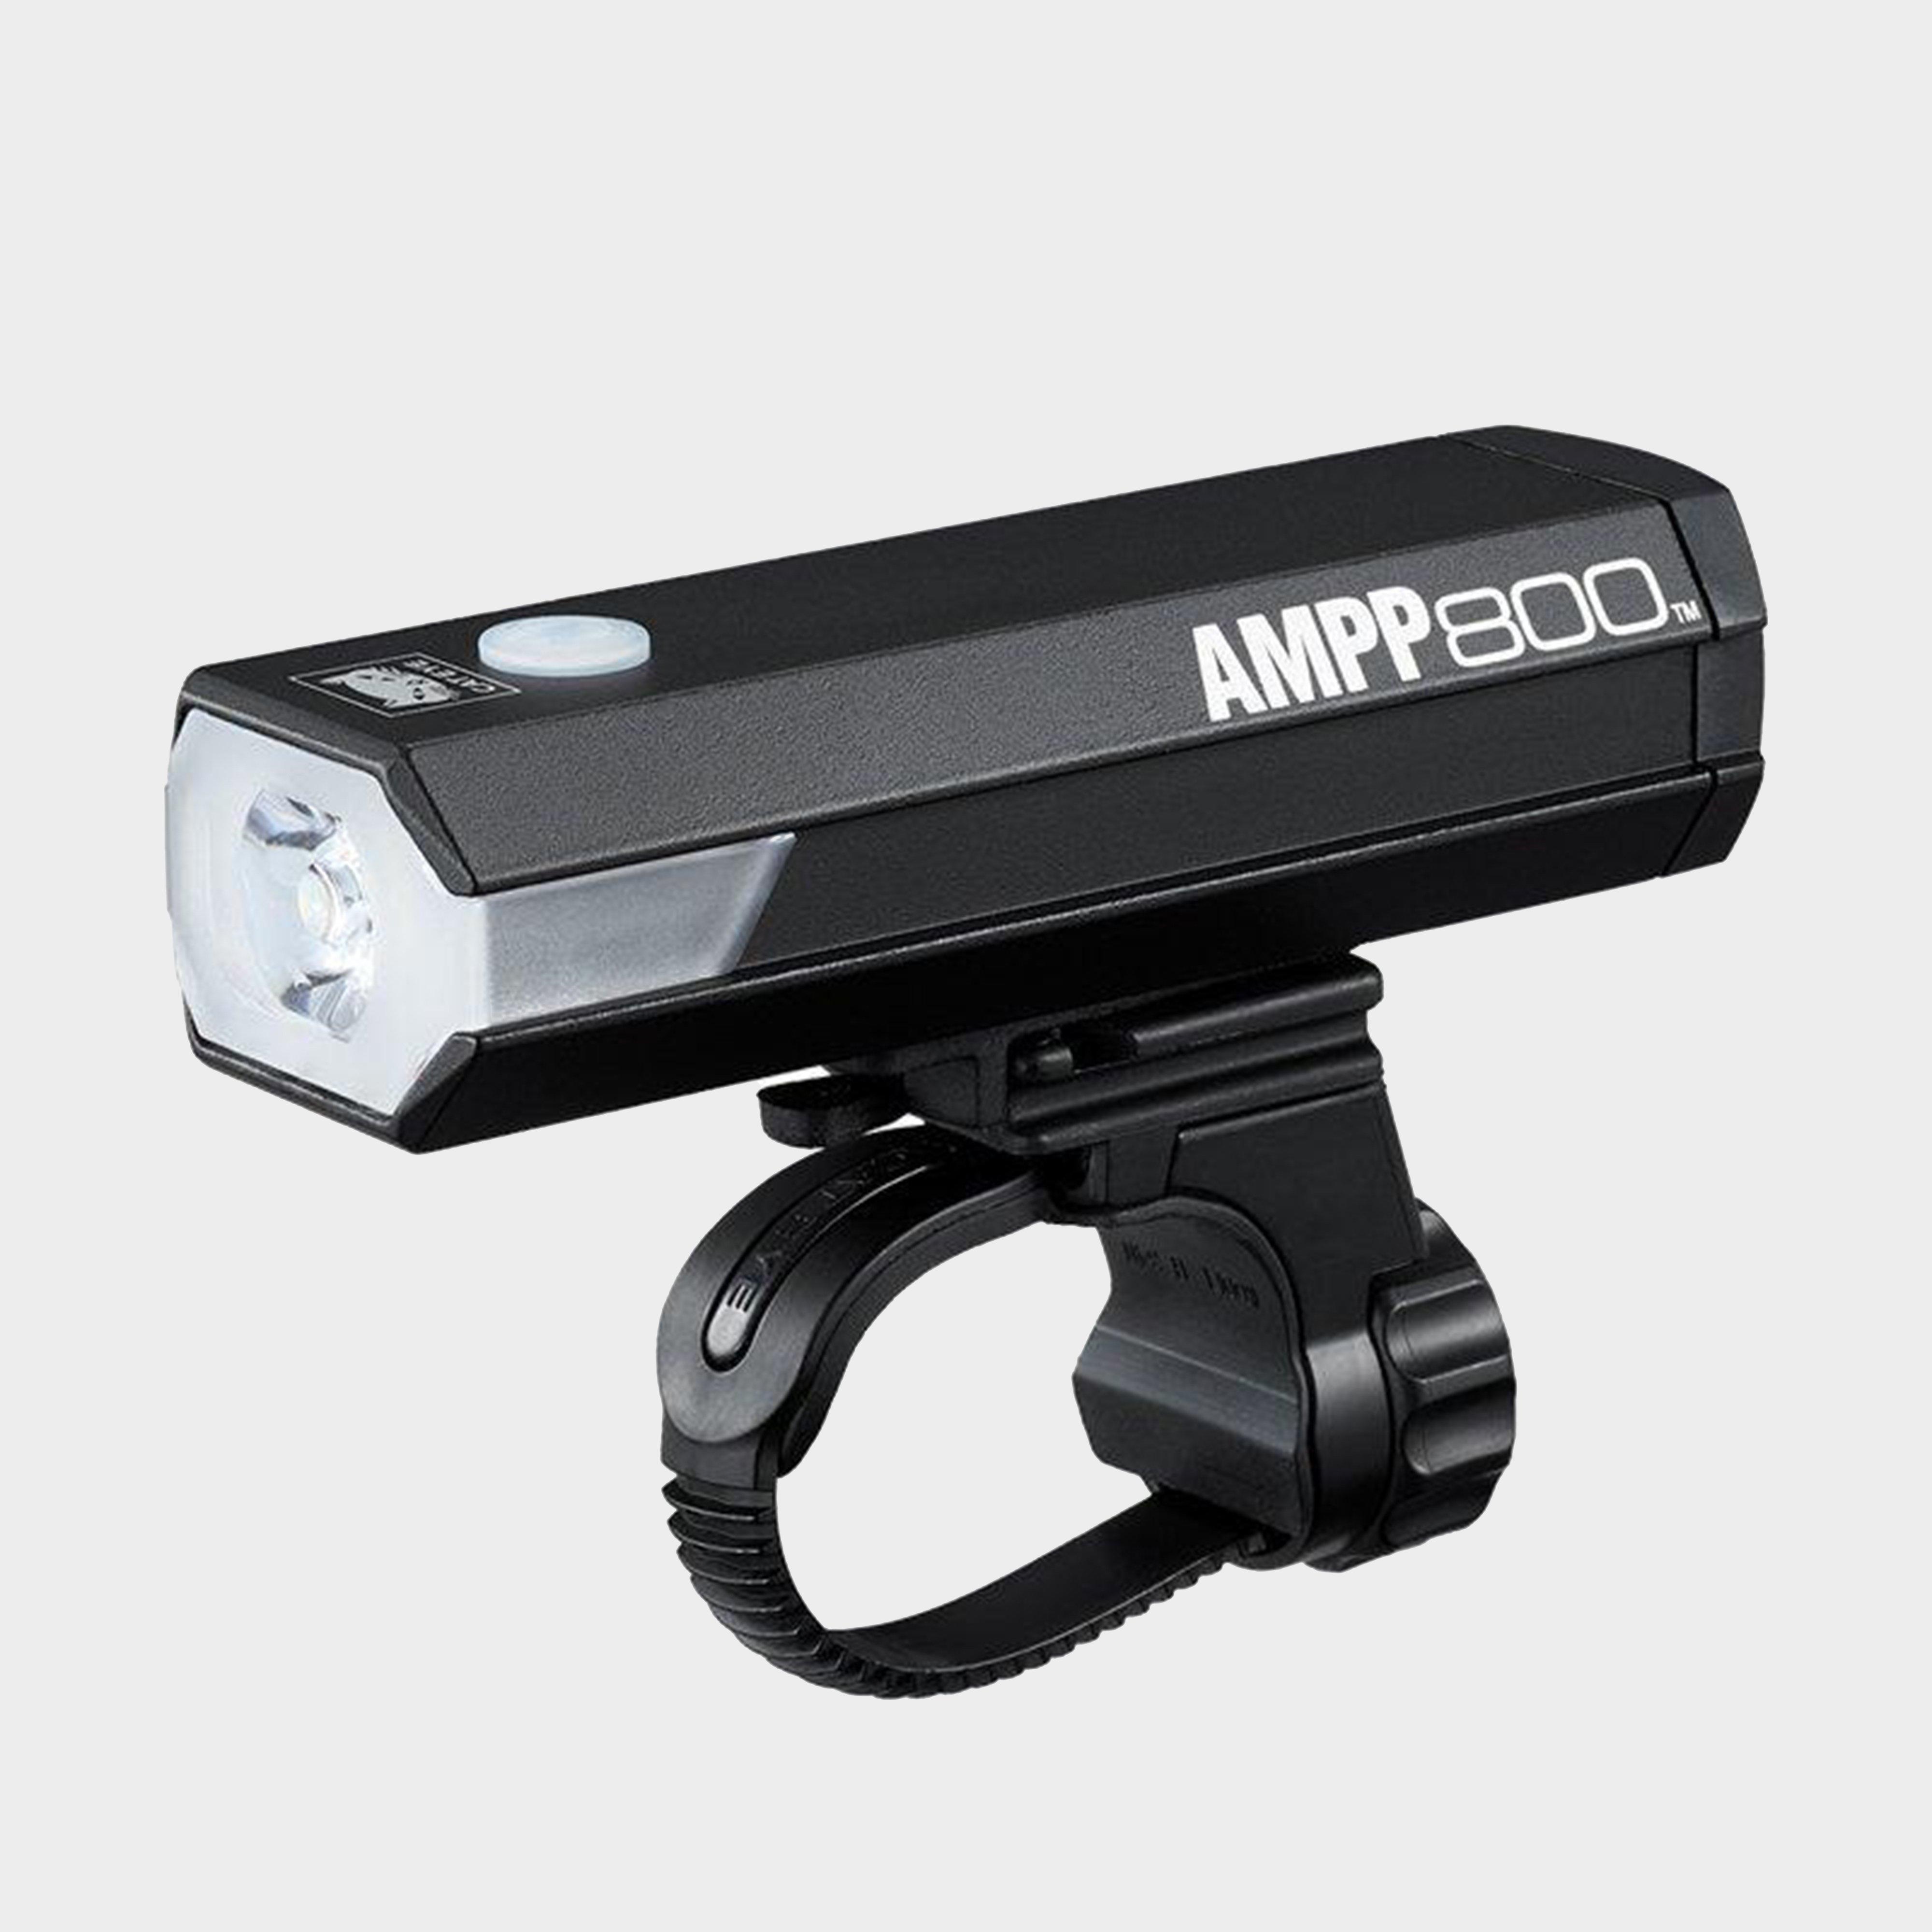 Cateye AMPP800 Front Bike Light, NO/NO